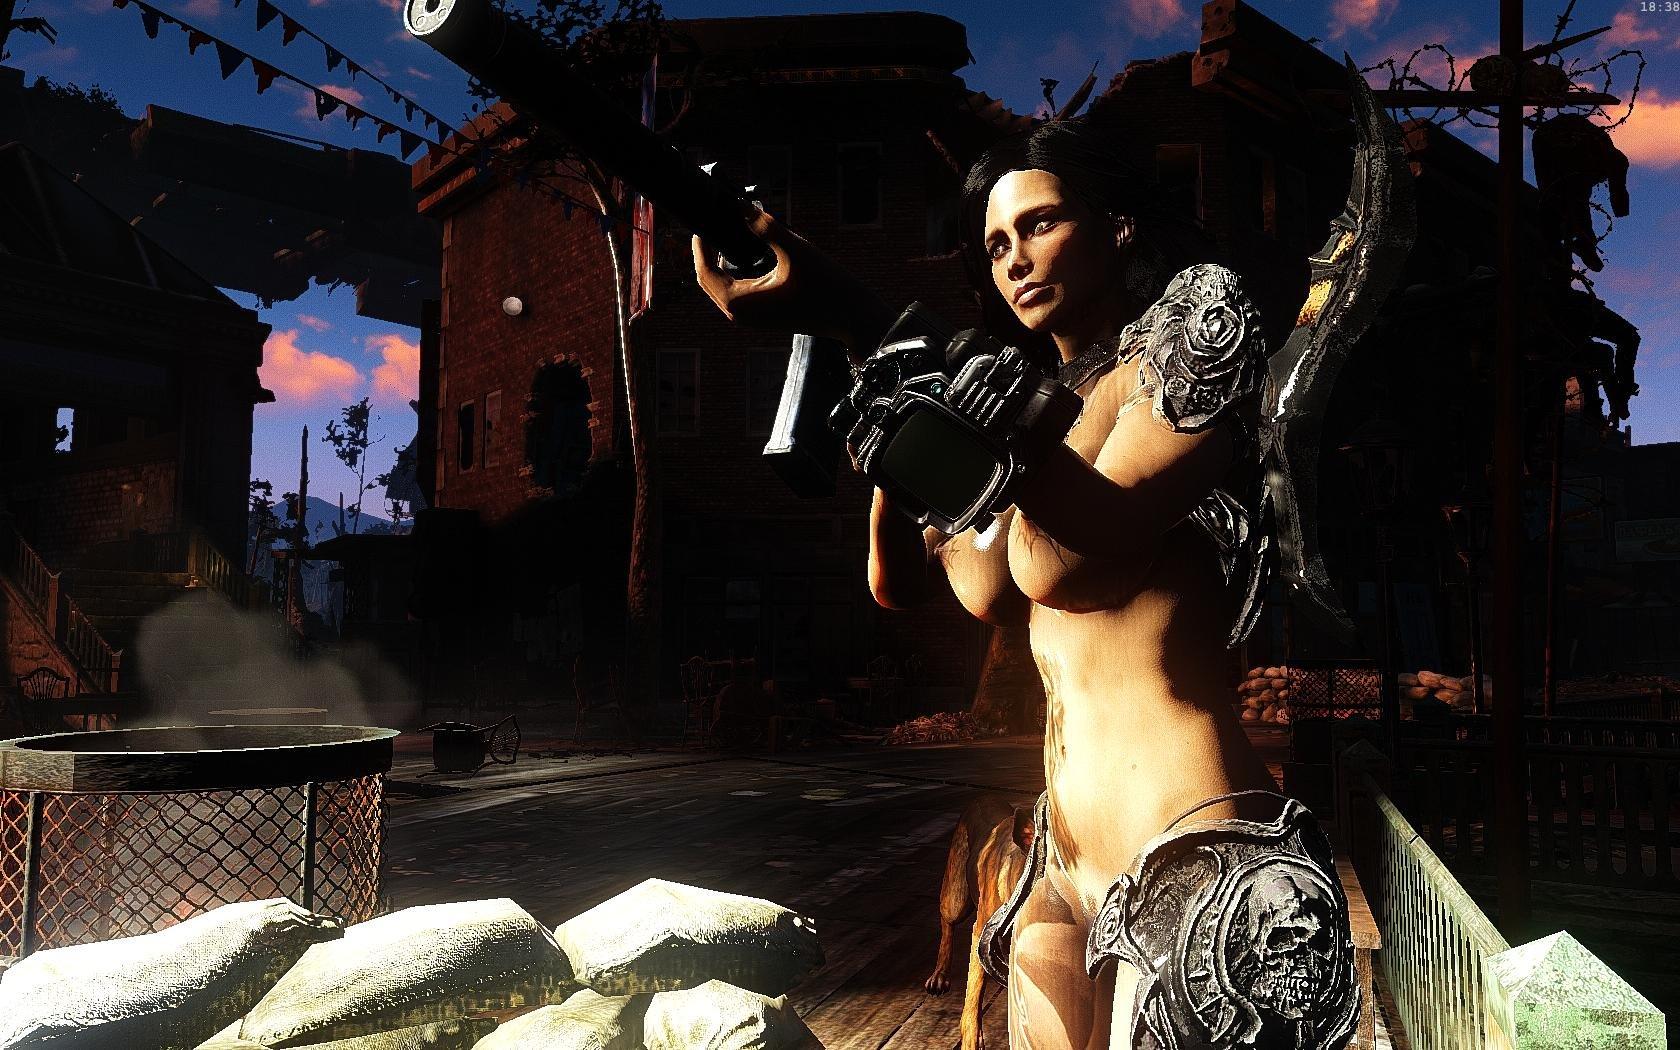 Fallout4 2019-02-05 18-38-26-19